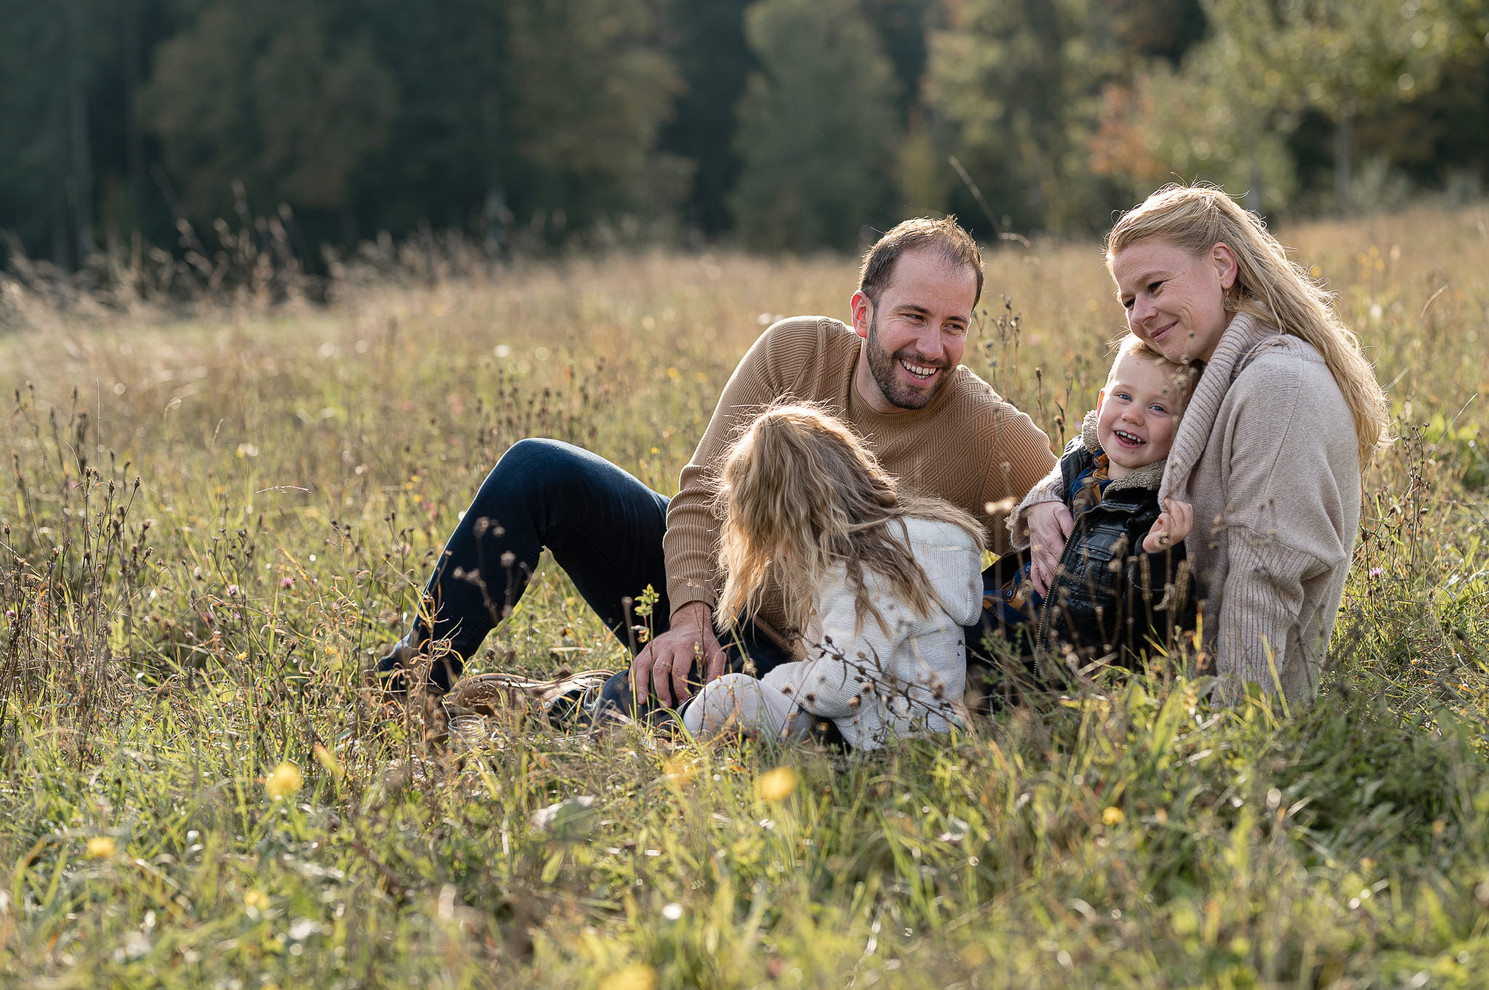 Familienfotos   jonas müller fotografie   zofingen